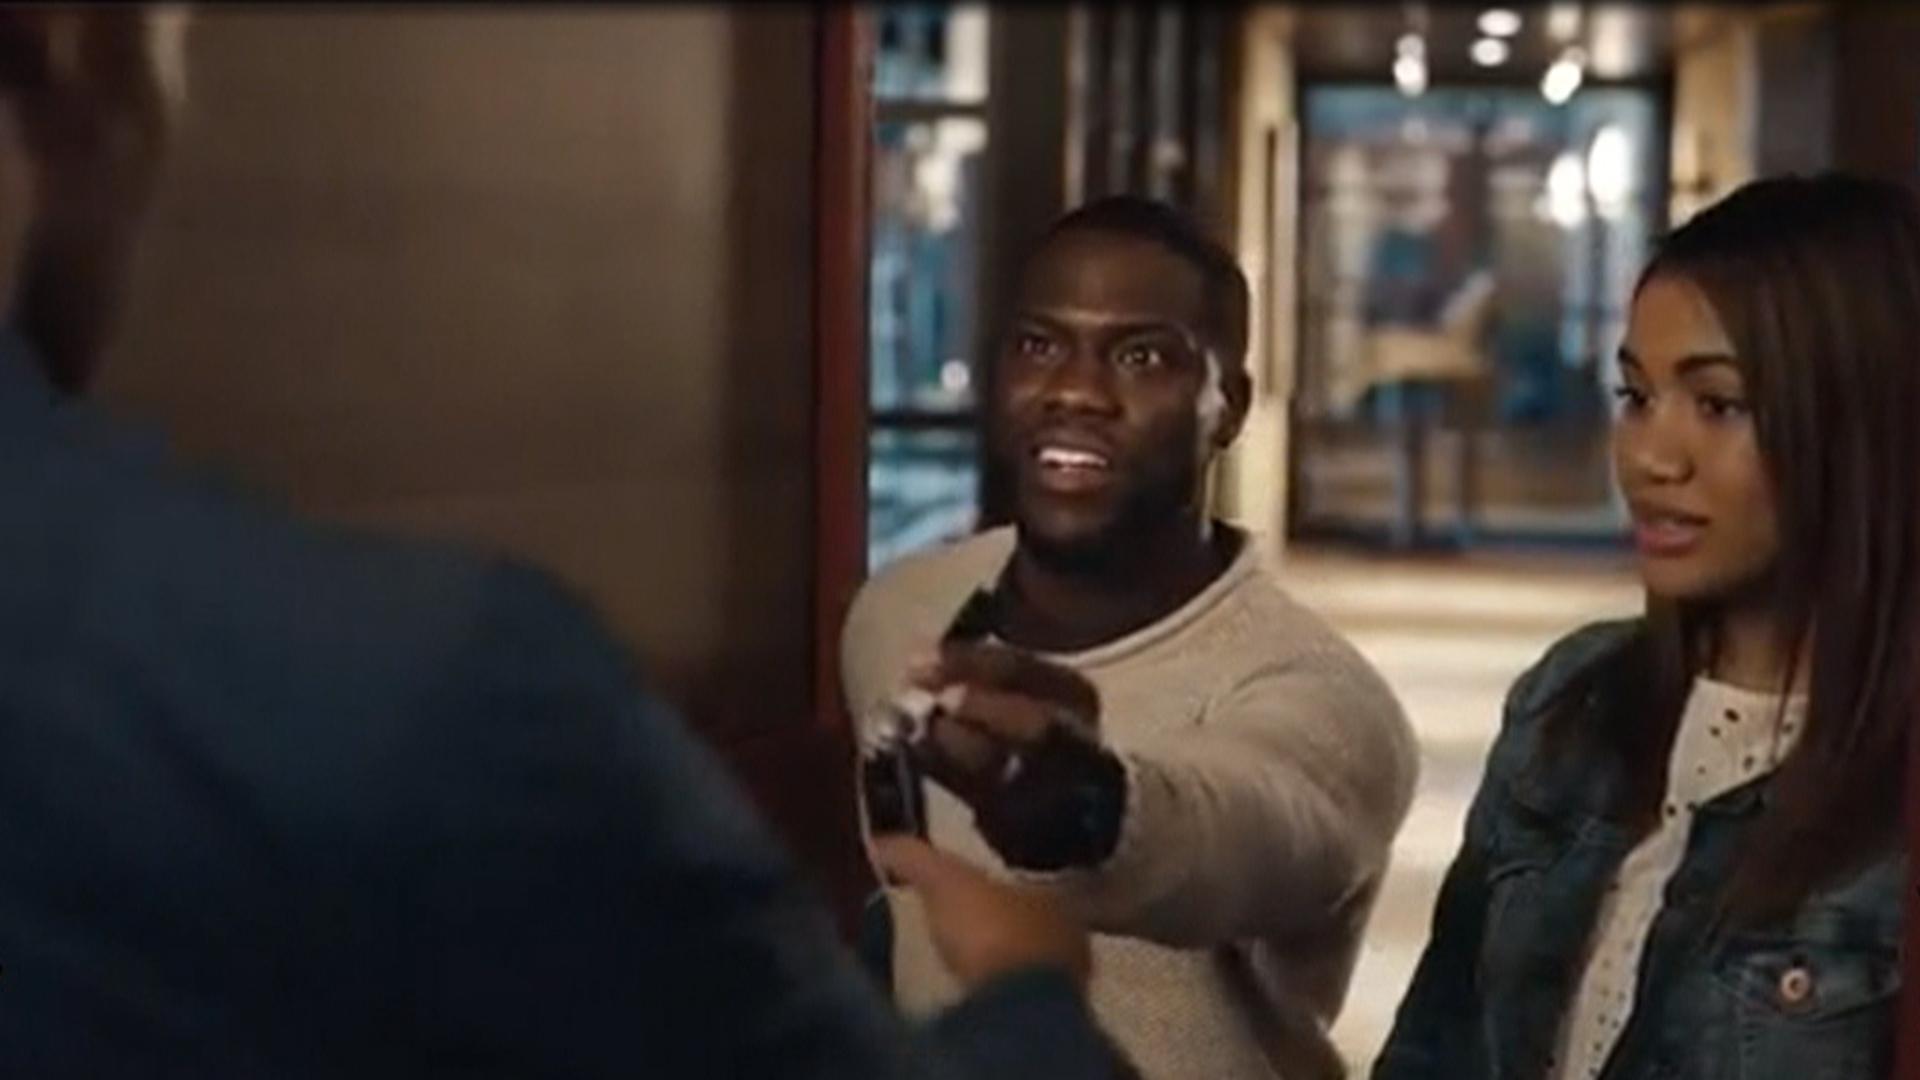 Hoda, Jenna Bush Hager relate to Kevin Harts Super Bowl 50 ad